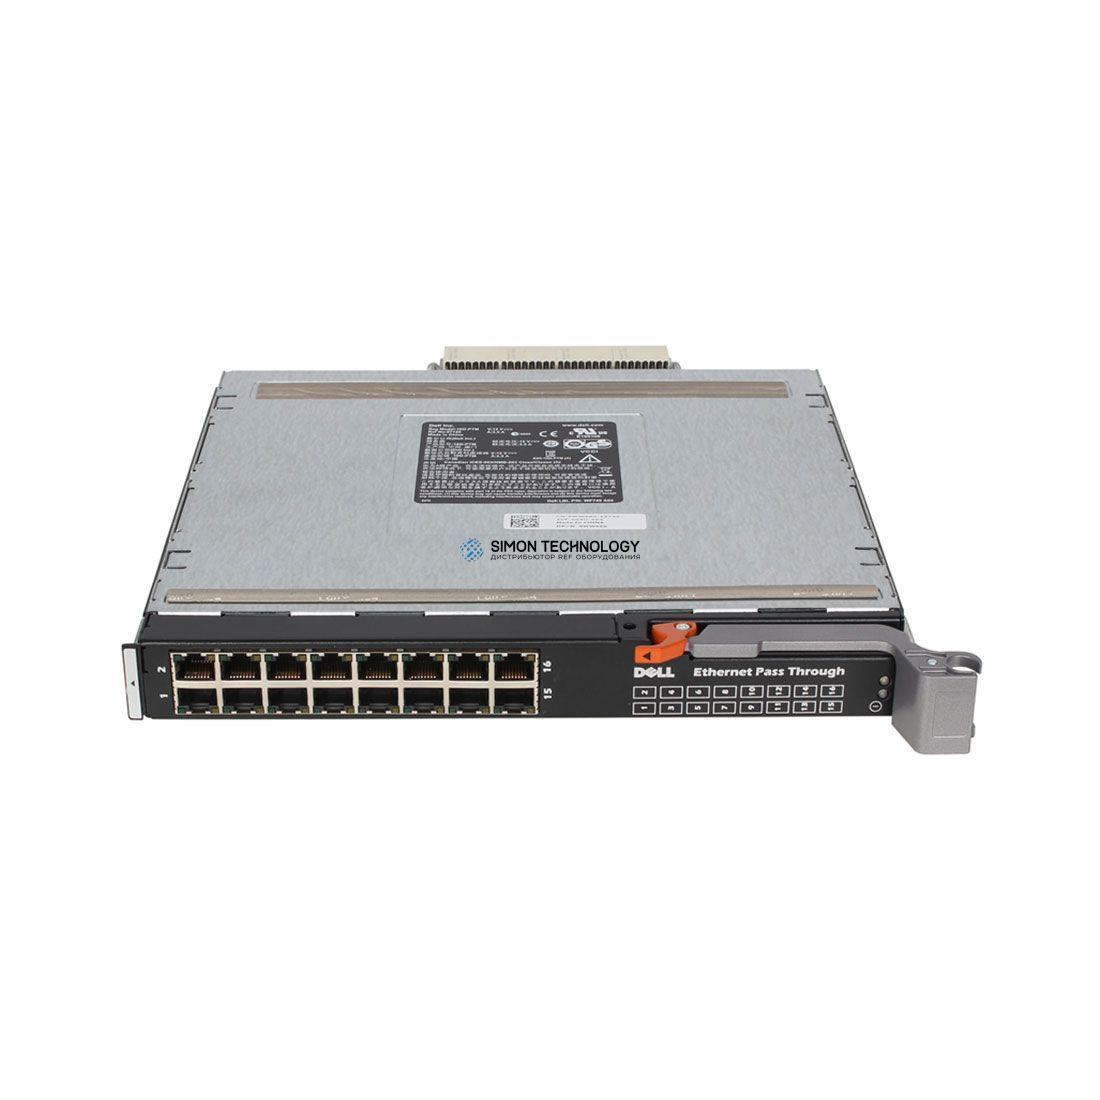 Модуль Dell DELL M1000E 16 Port Ethernet Pass through Module (0WW060)